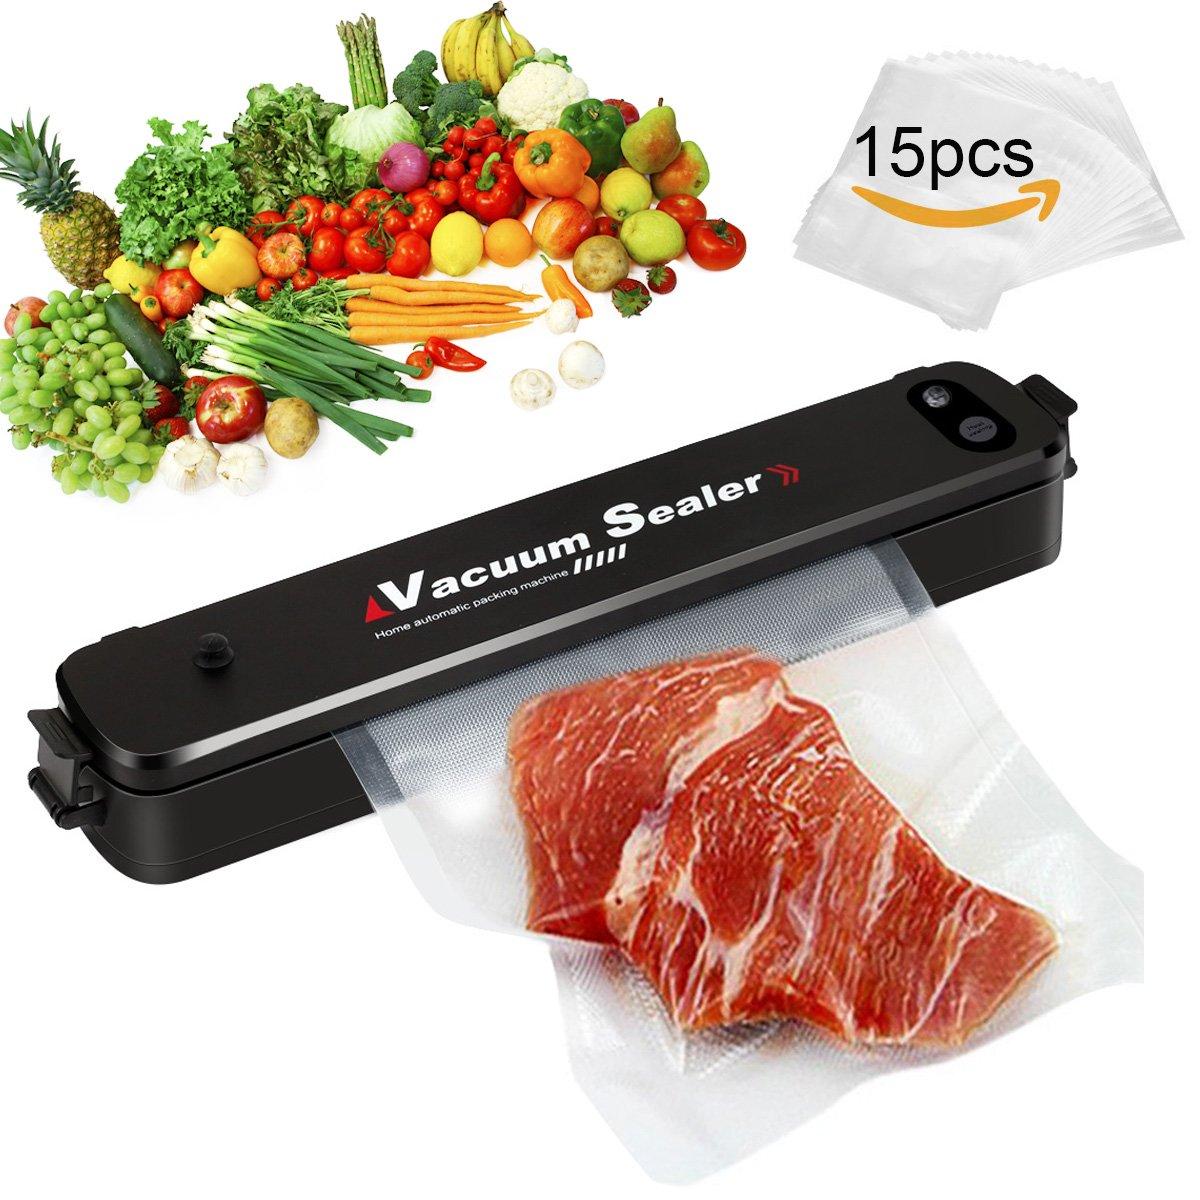 Vacuum Sealer Machine, Compact Vacuum Sealer, Vacuum Sealing System for Food Preservation, with 15 Reusable Vacuum Sealer Bags, Black